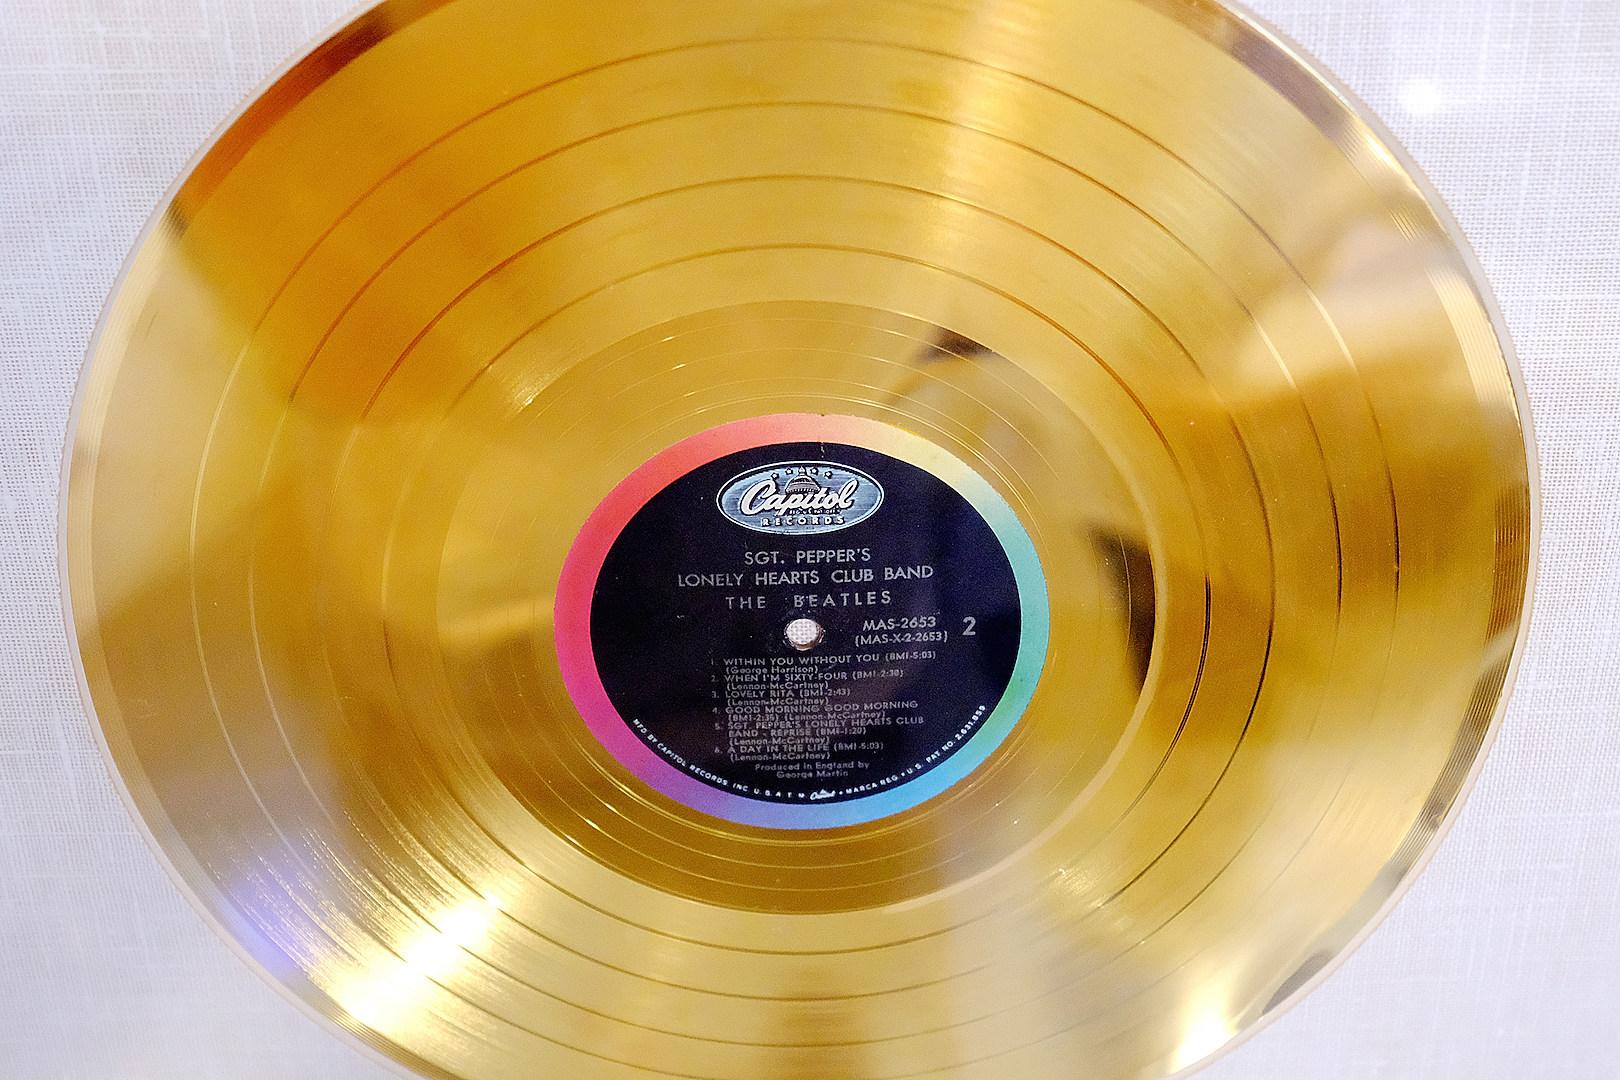 DragonForce + Aerosmith/Run-D.M.C. Go Platinum, Godsmack Go Gold